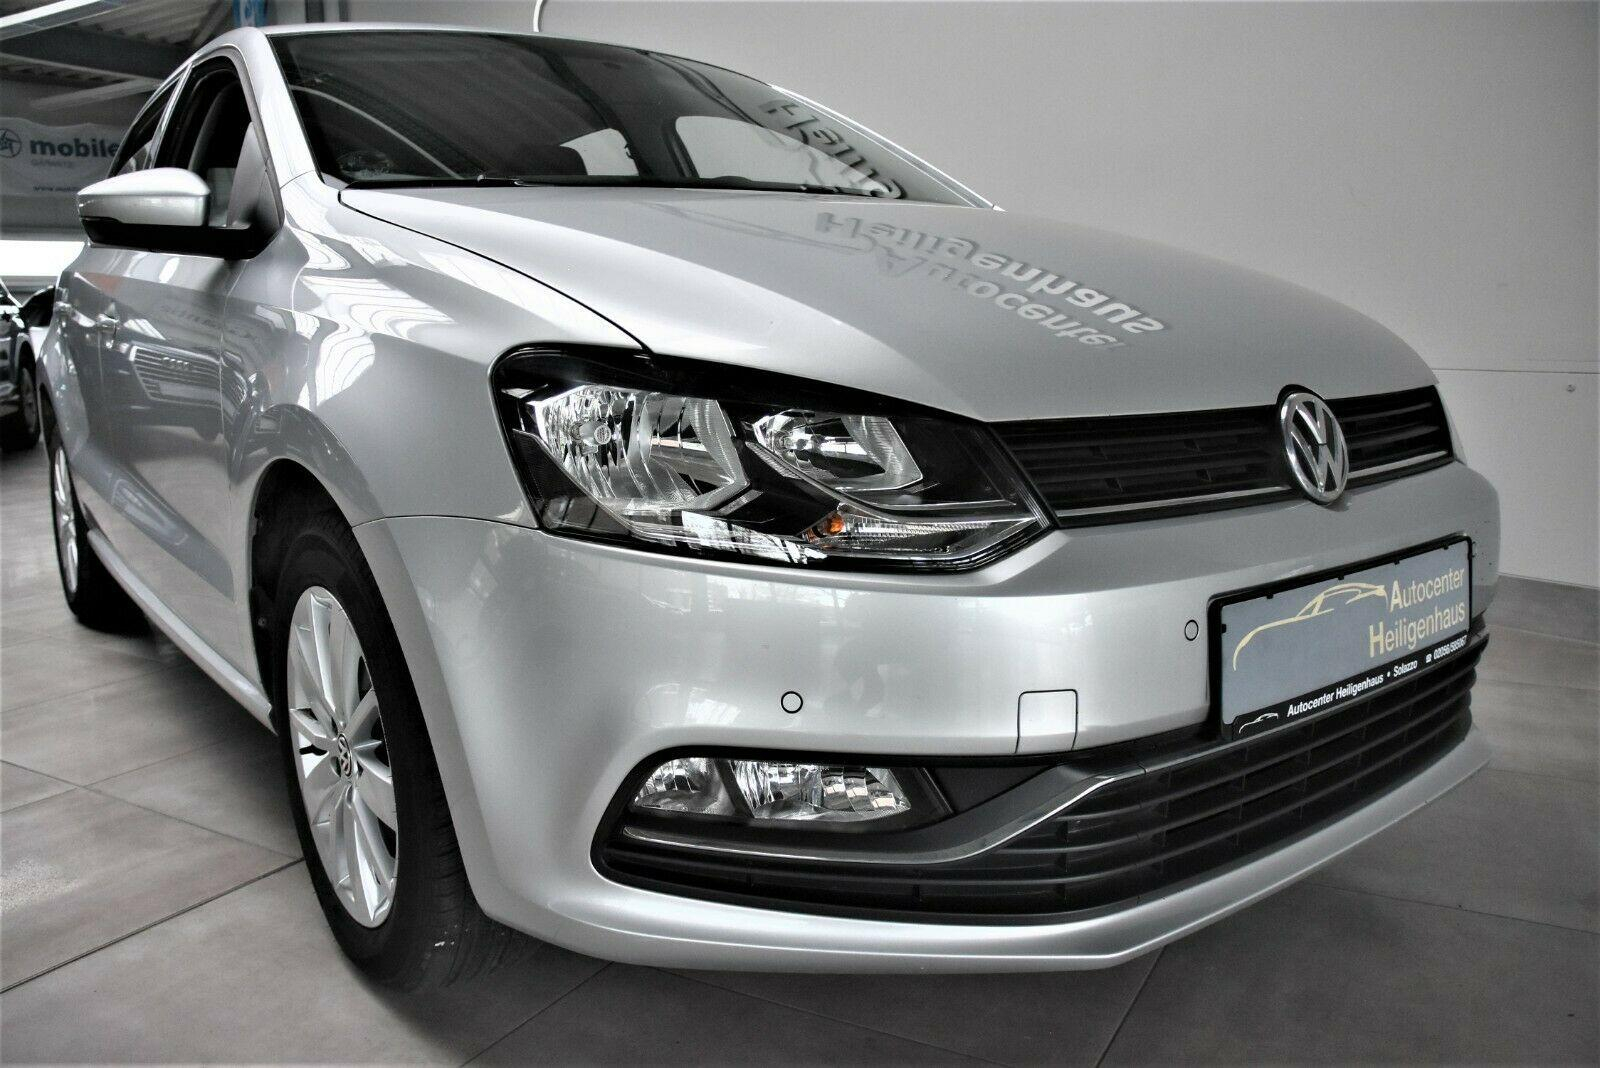 Volkswagen Polo V 1.2 TSI Comfortline BMT Alufelgen PDC 1Hd